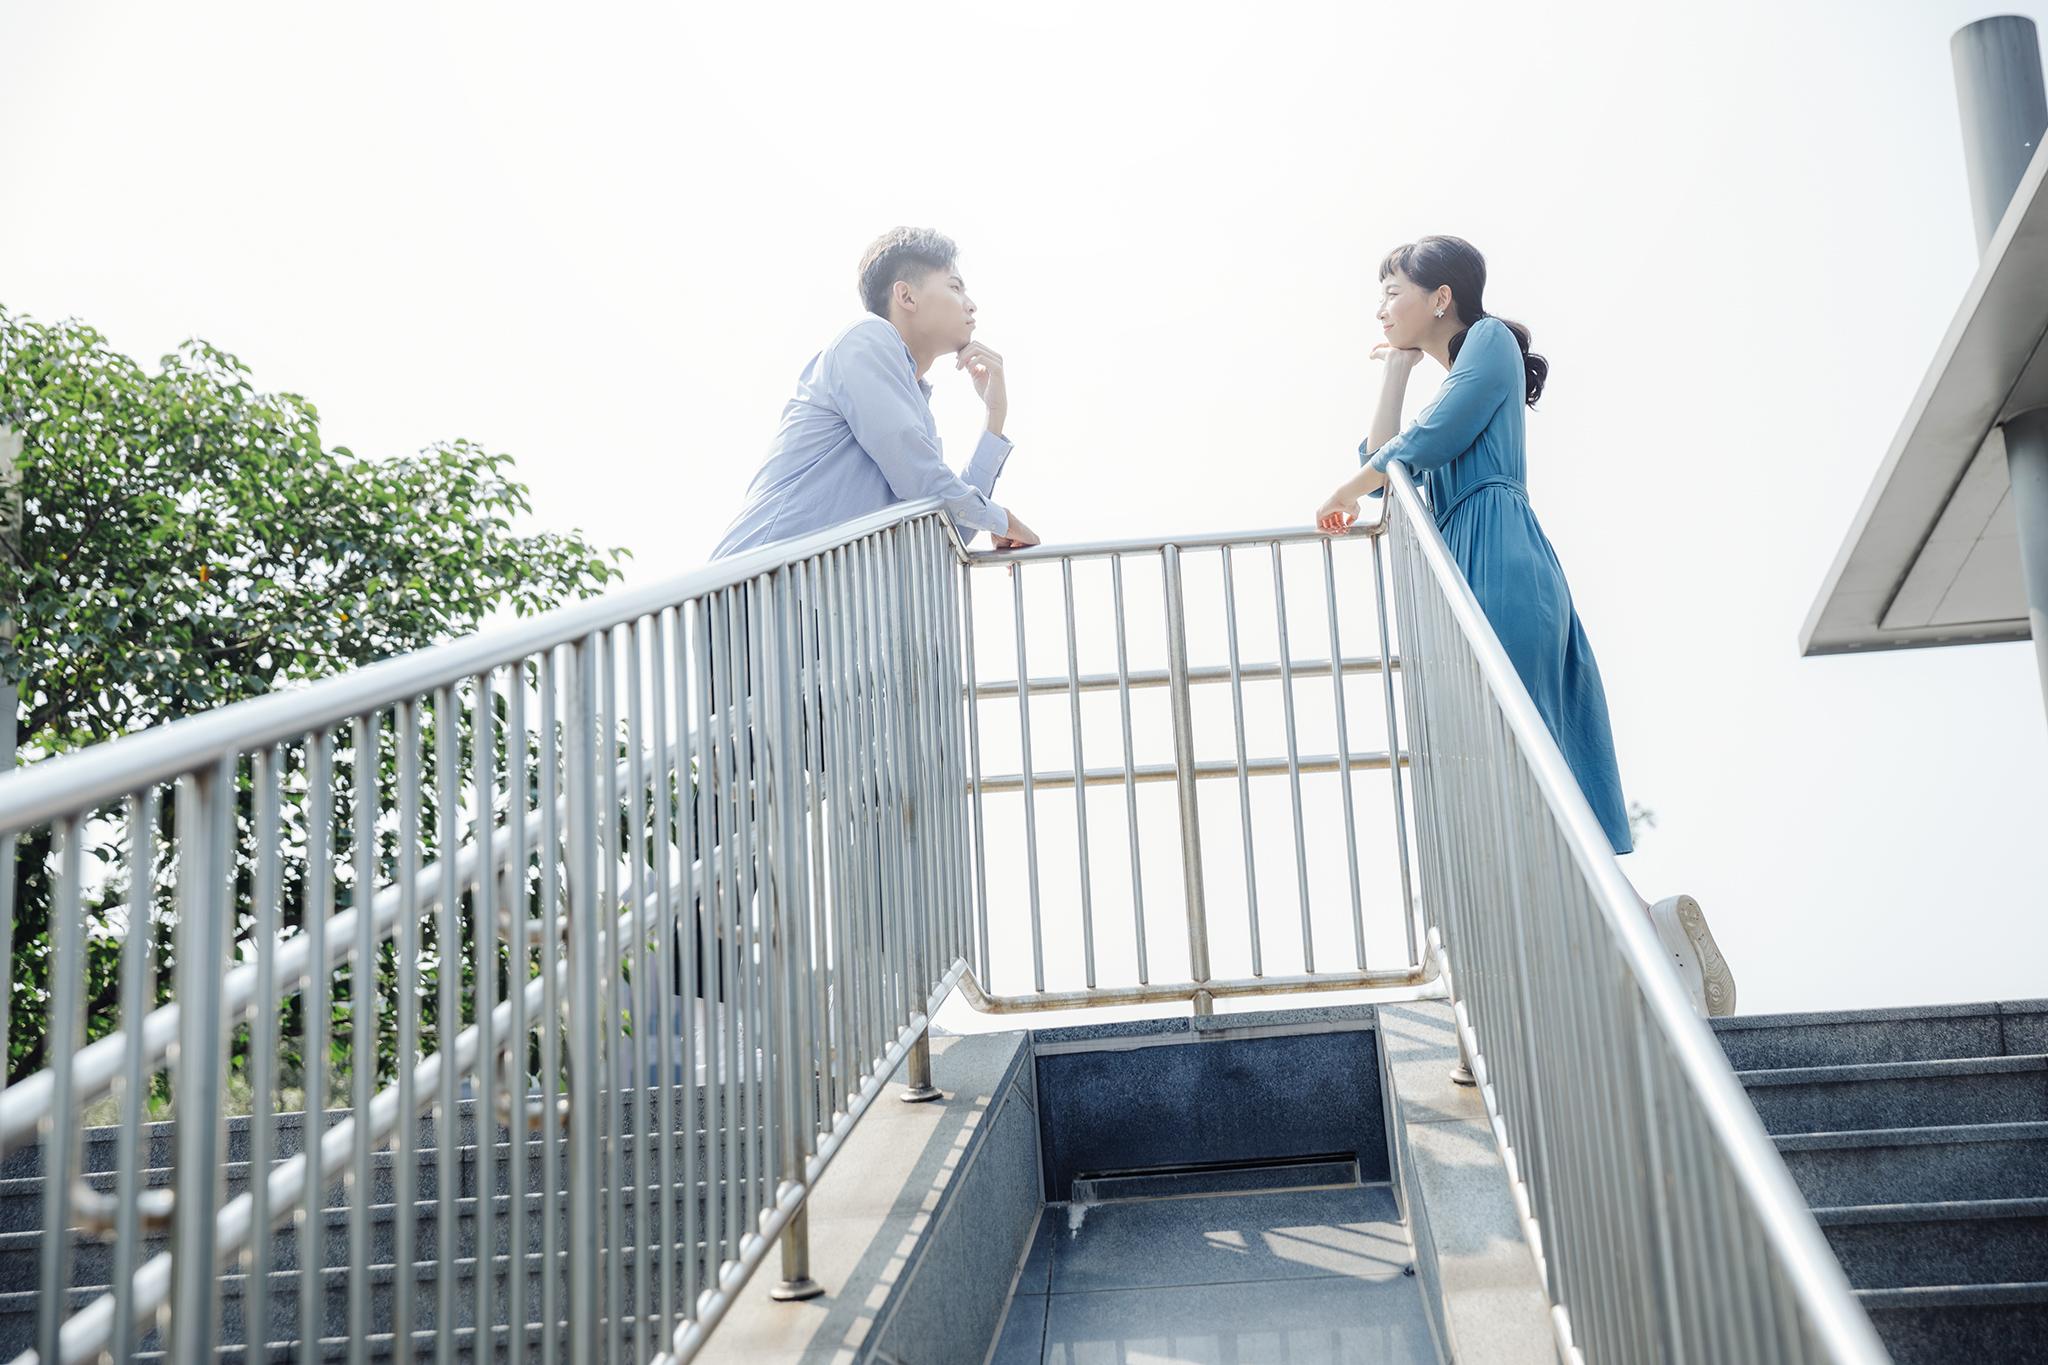 49818351952 7d7794f964 o - 【自助婚紗】+允宥&珮嘉+